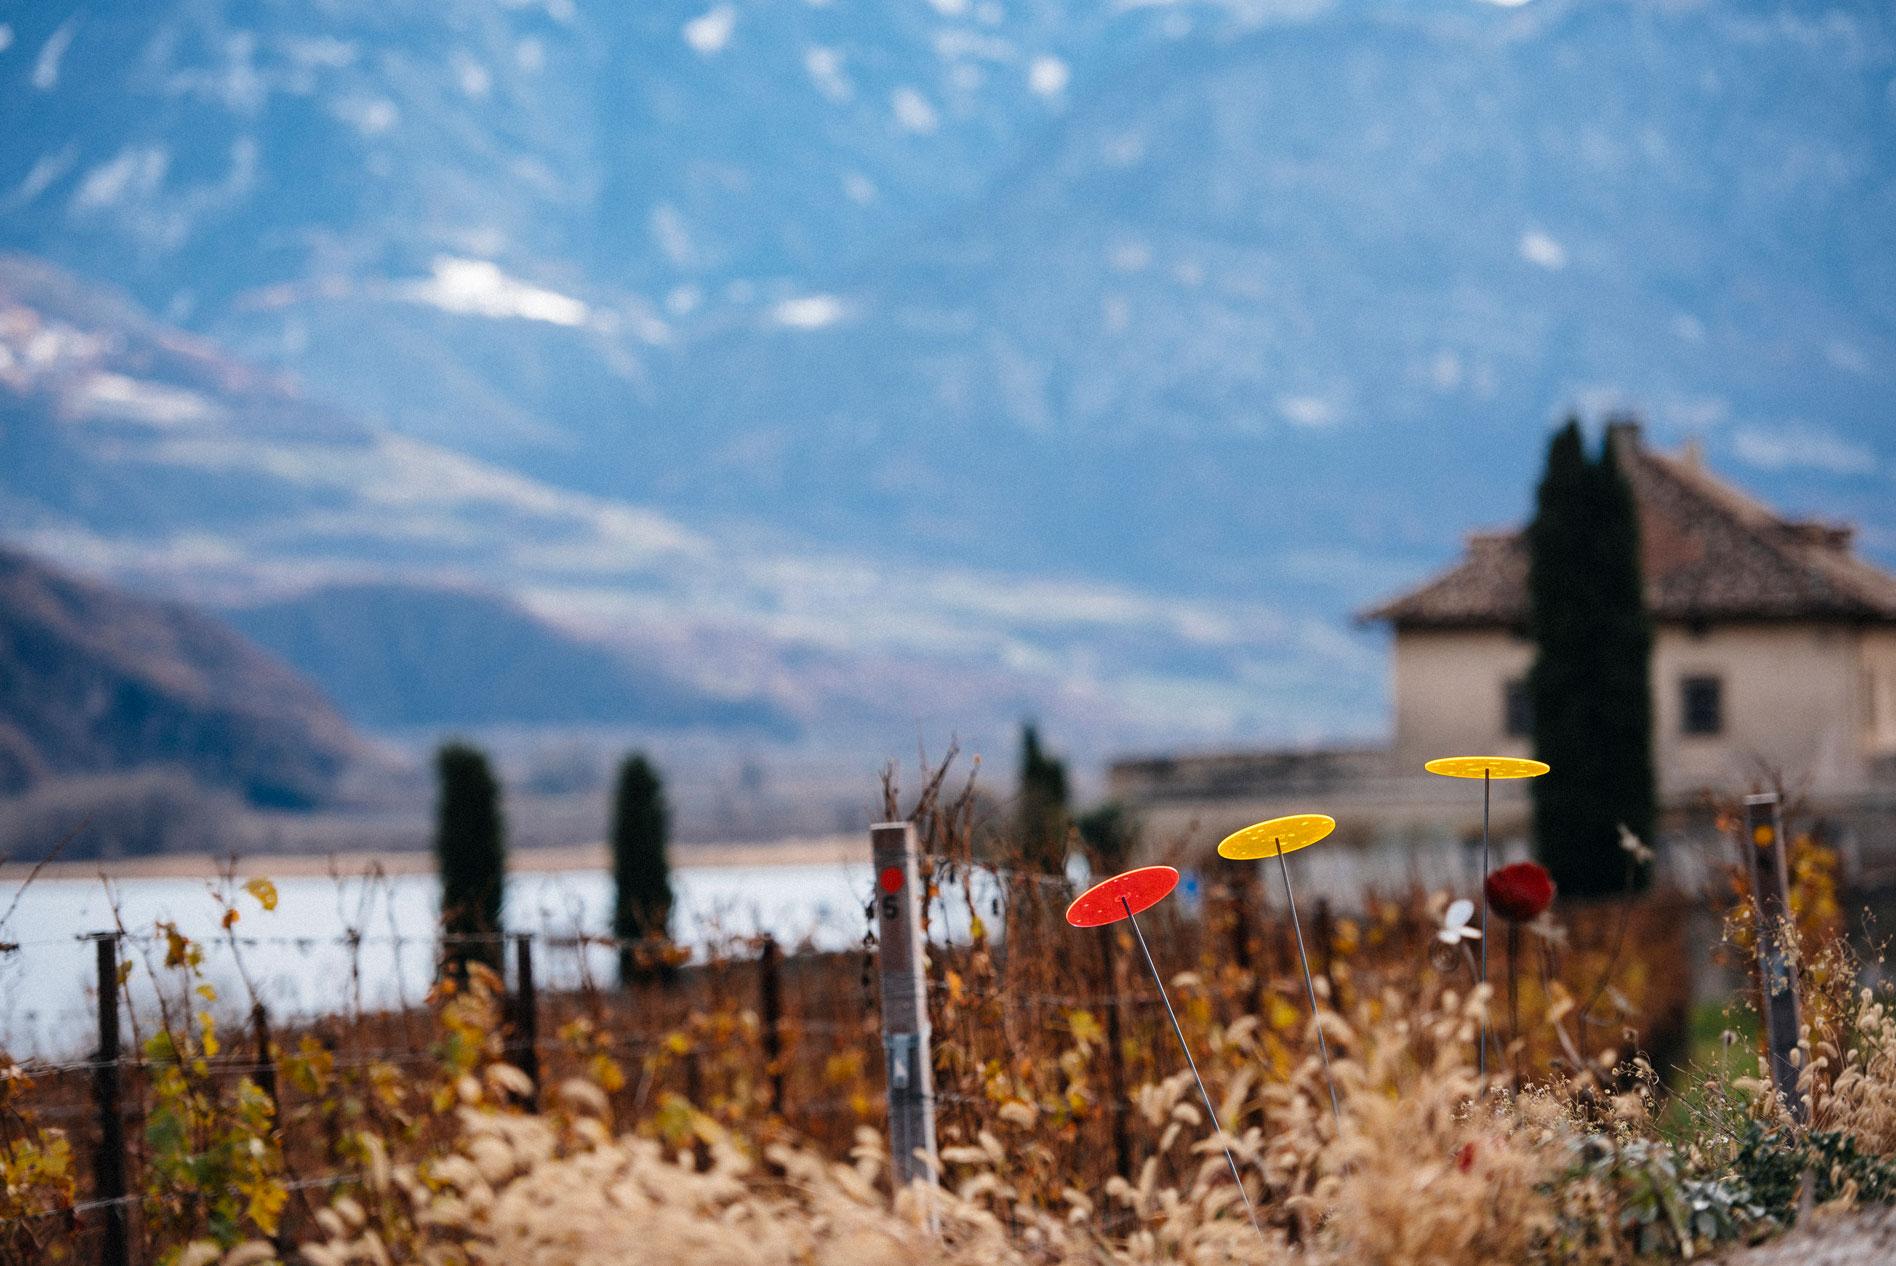 Manincor   Caldaro   Alto Adige   Italy